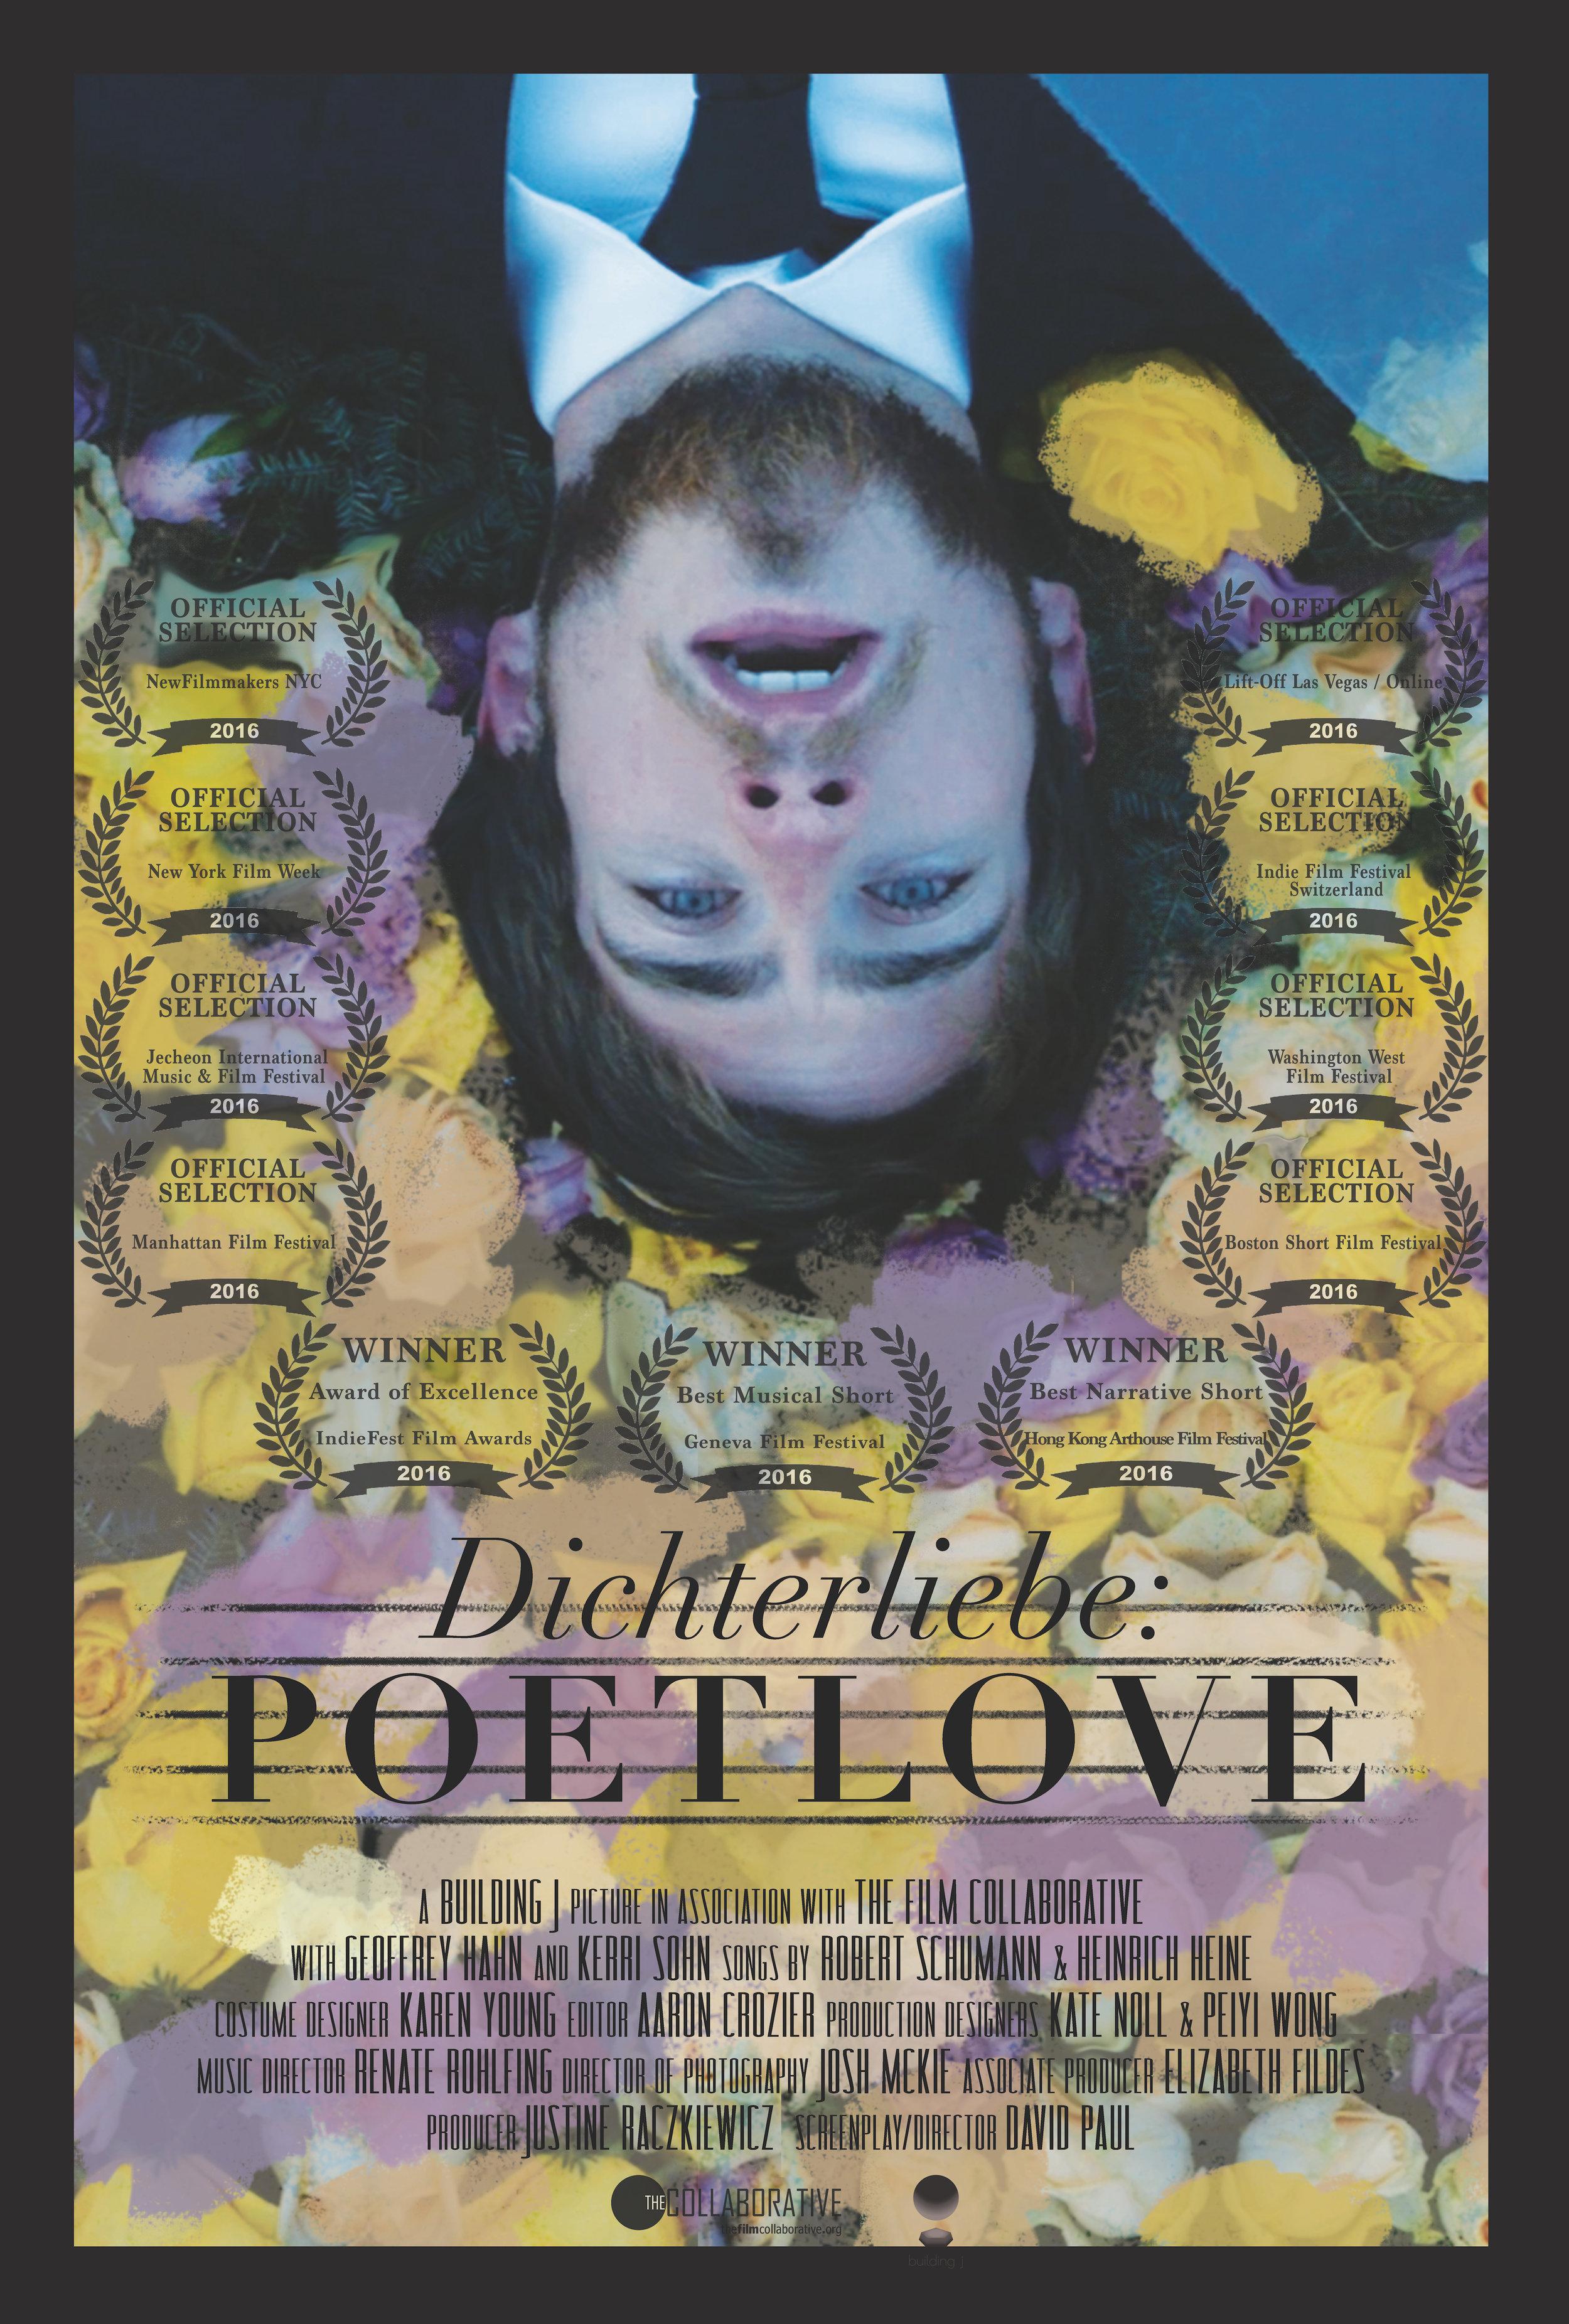 Dichterlieb: Poetlove